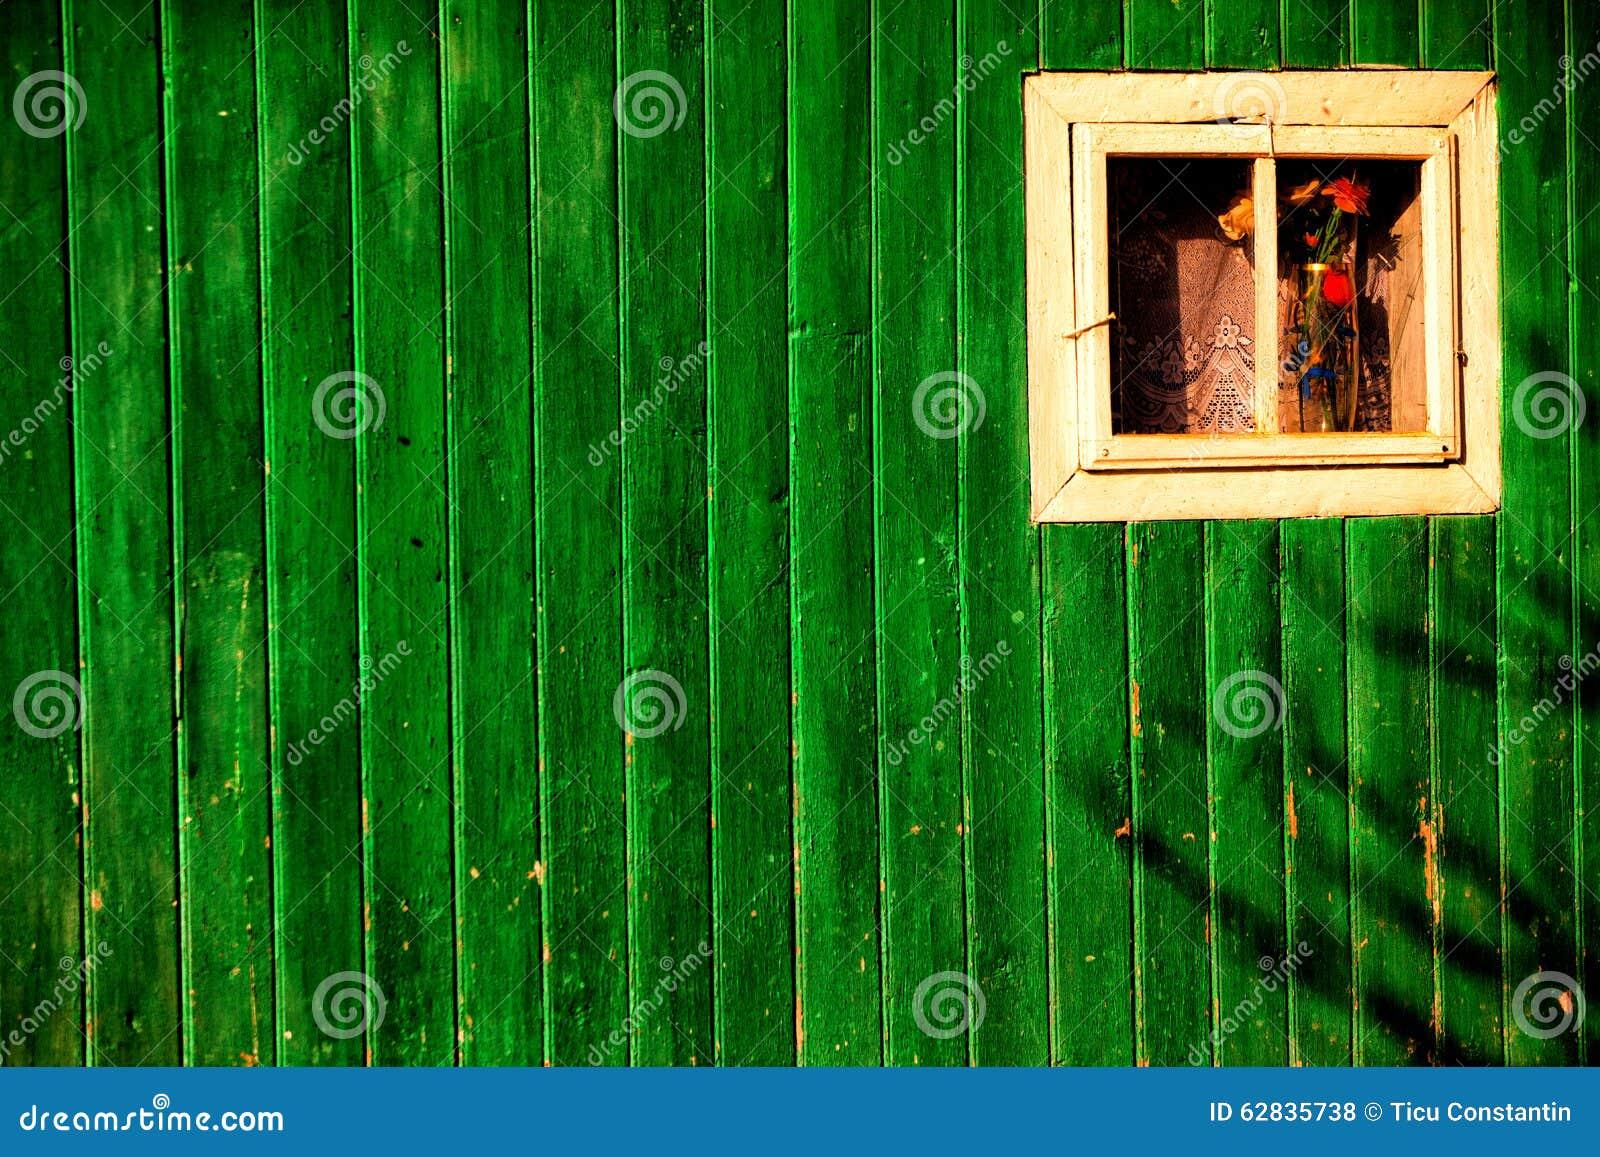 Flowers In Window Stock Photo Image 62835738